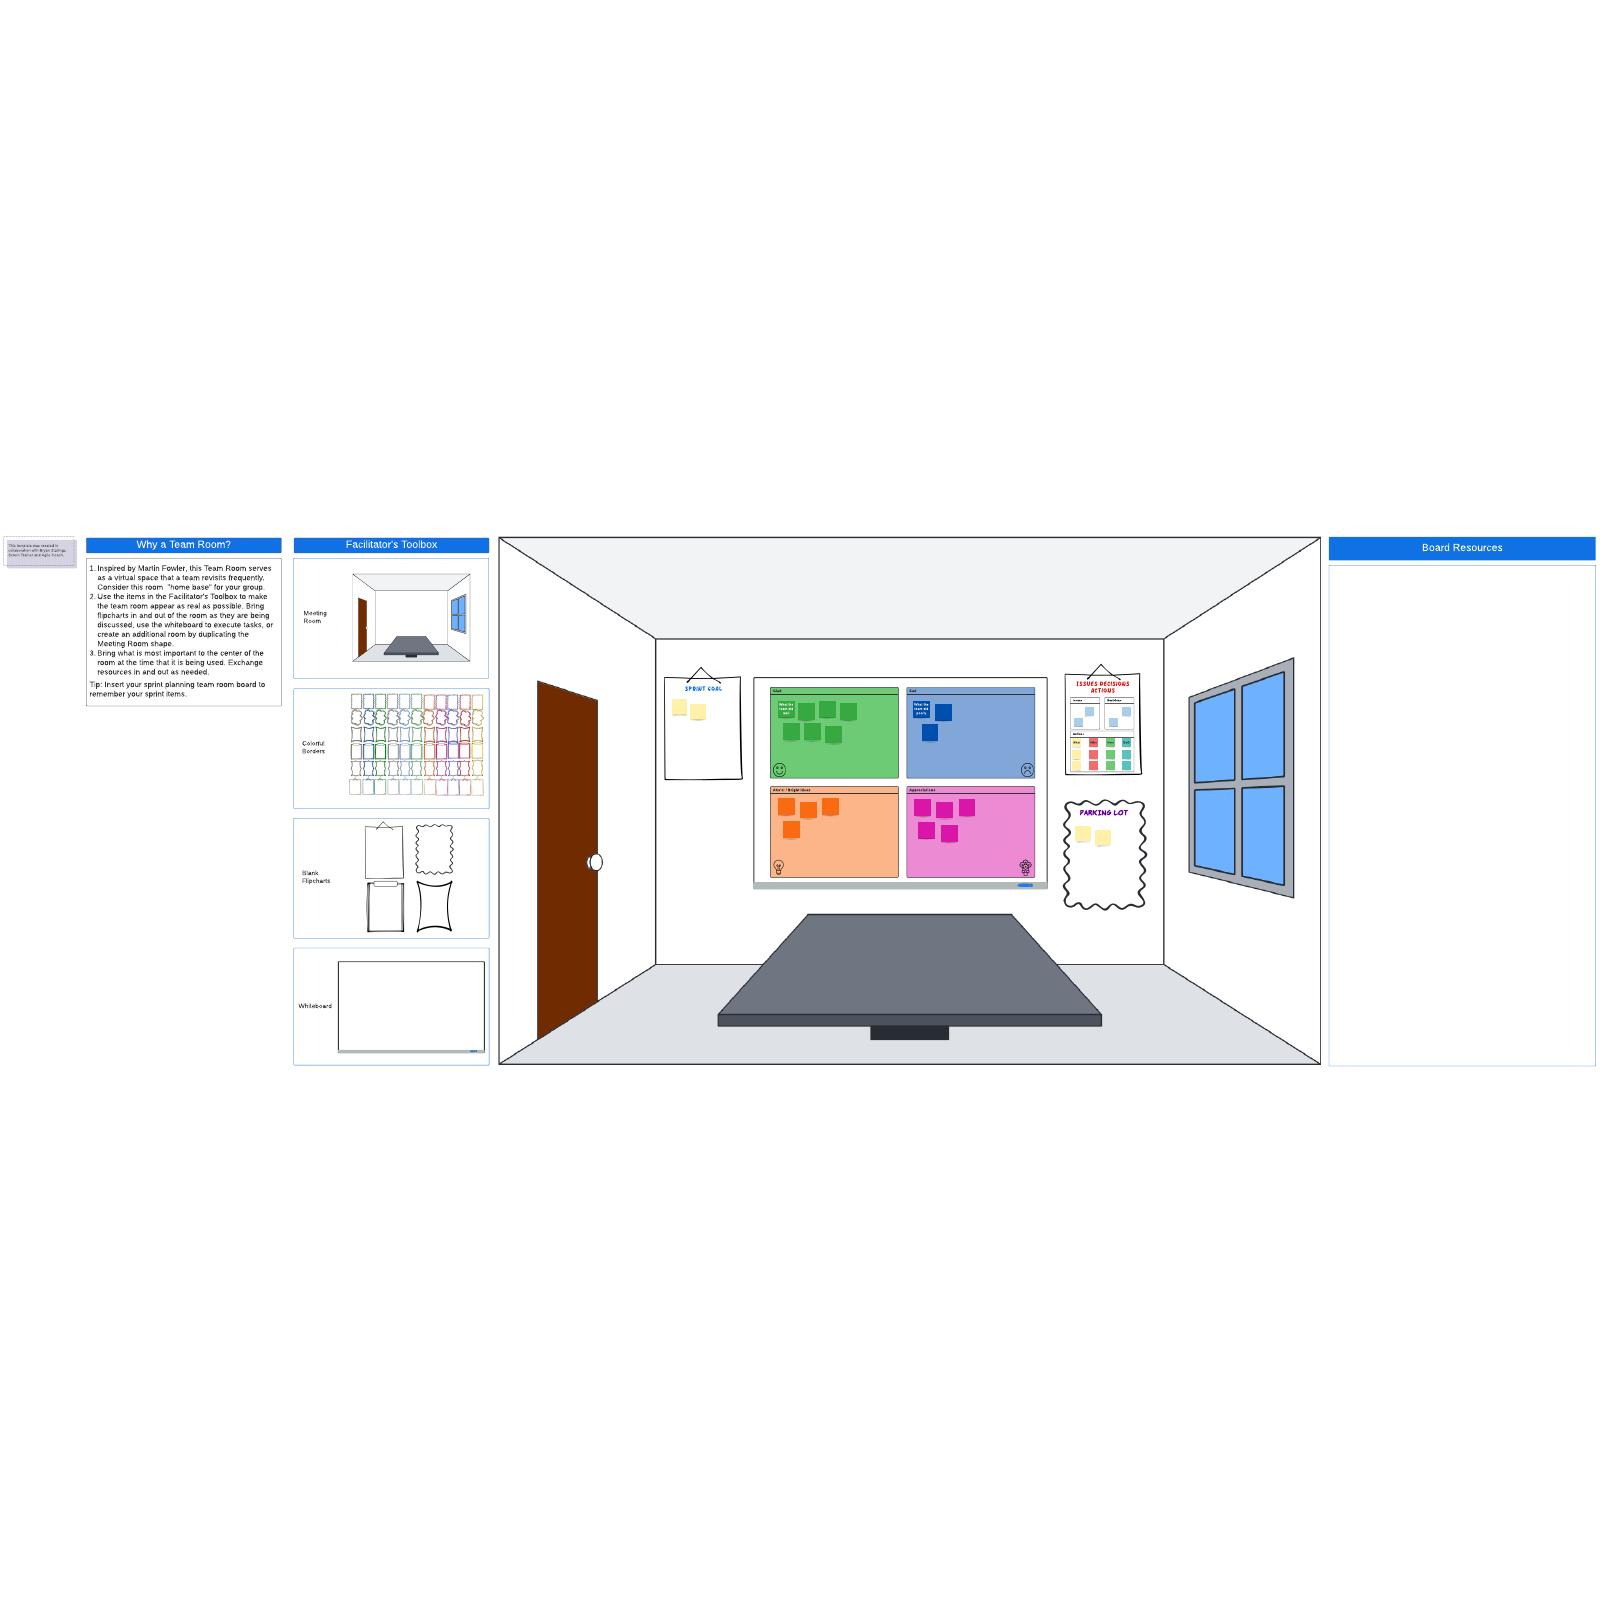 Sprint retrospective team room